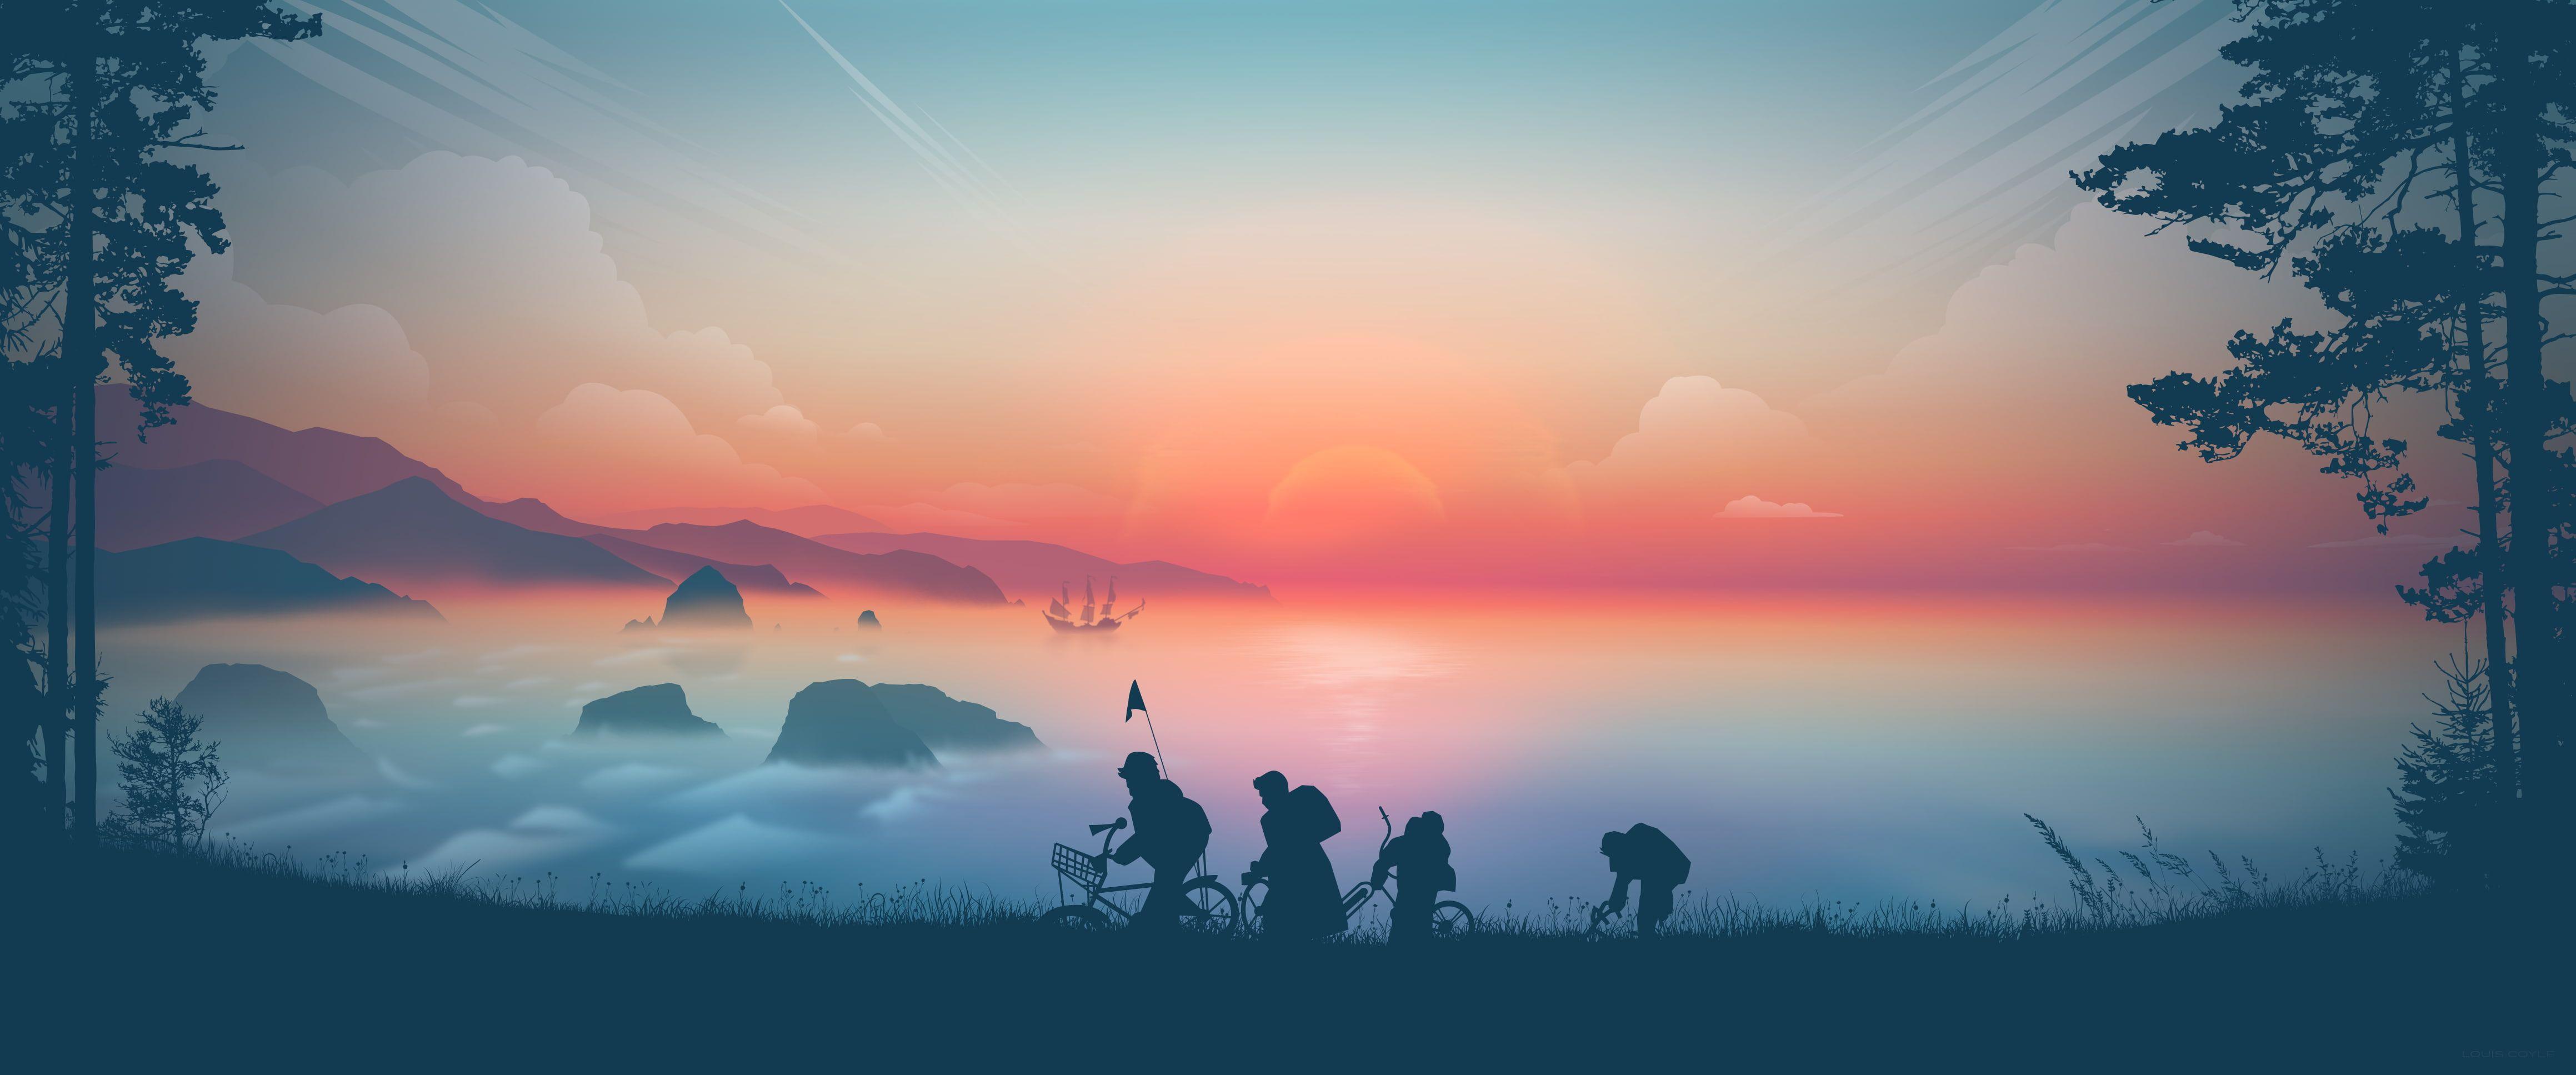 Artwork Digital Art The Goonies Sunset Clouds Mist Pirate Ship Trees Gradient Illustration Landsc Imac Desktop Dual Monitor Wallpaper Android Wallpaper